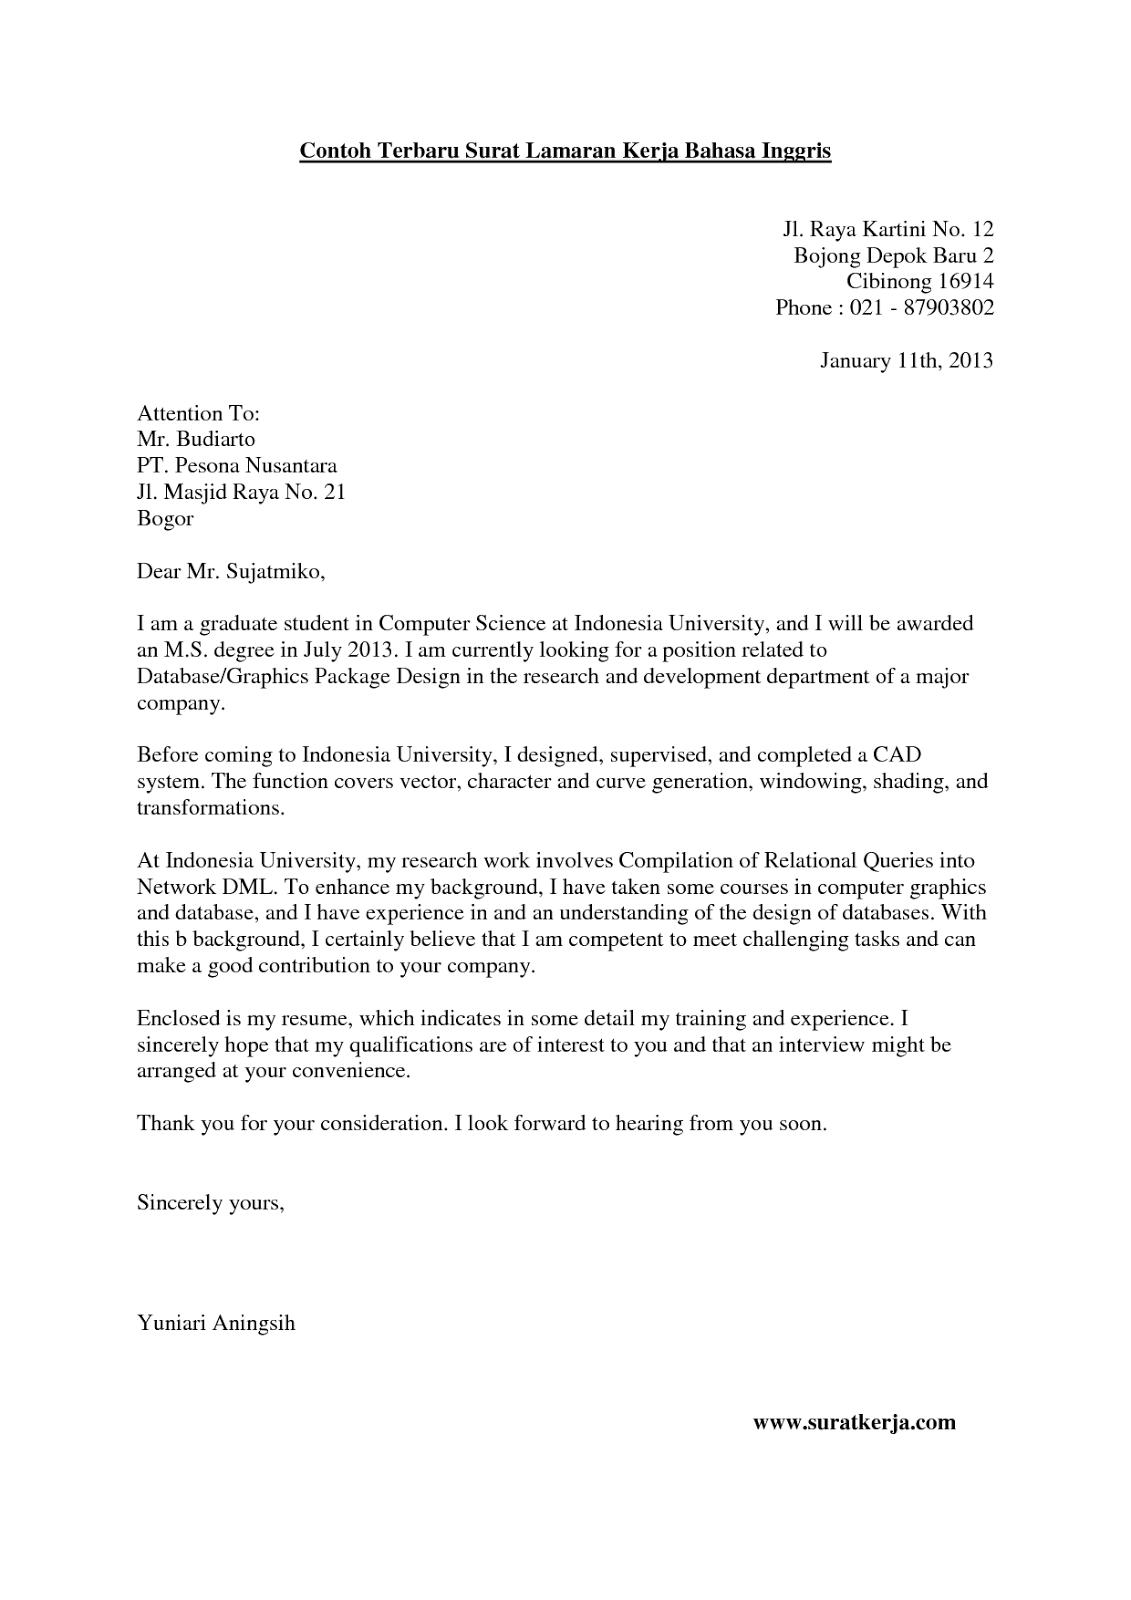 Contoh Surat Lamaran Kerja Bhs Inggris di 2020 Bahasa